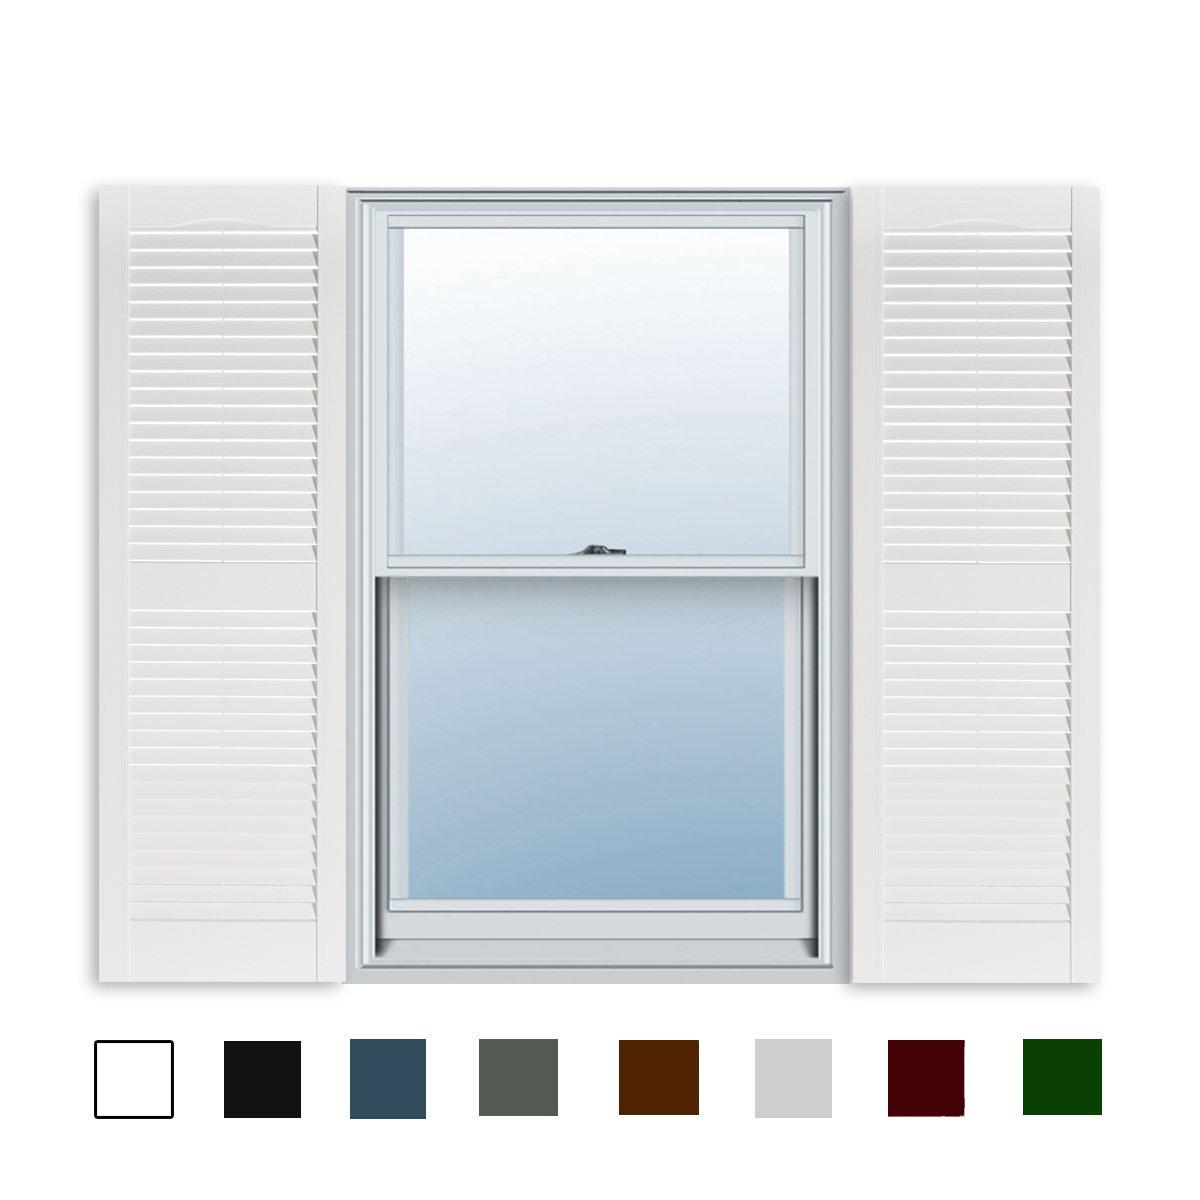 ExteriorSolutions.com 15 Inch x 51 Inch Standard Louver Exterior Vinyl Window Shutters, White (Pair)